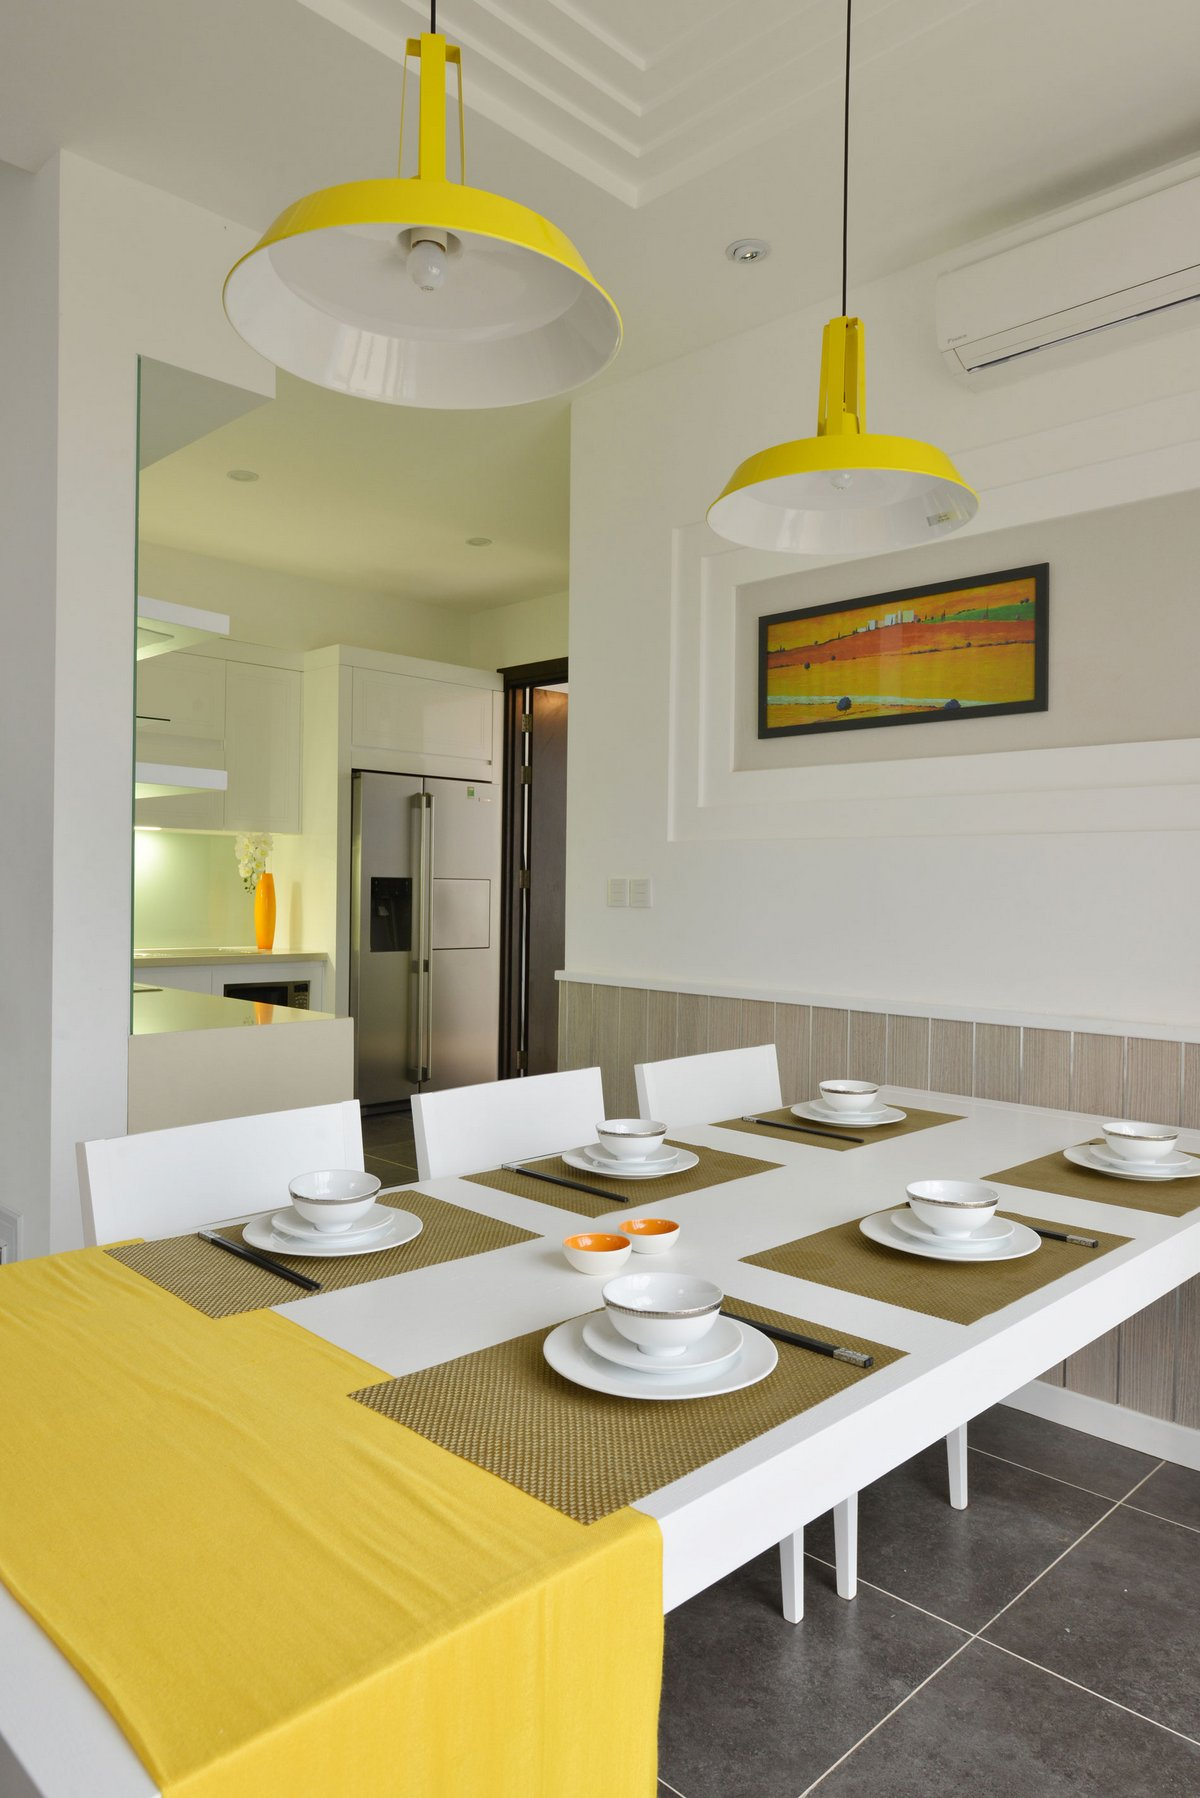 Landmak Architecture, Вьетнам, дом на 2 семьи, таунхаус, фото таунхауса, варианты таунхаусов, дома во Вьетнаме, SD House, план дома, съема дома